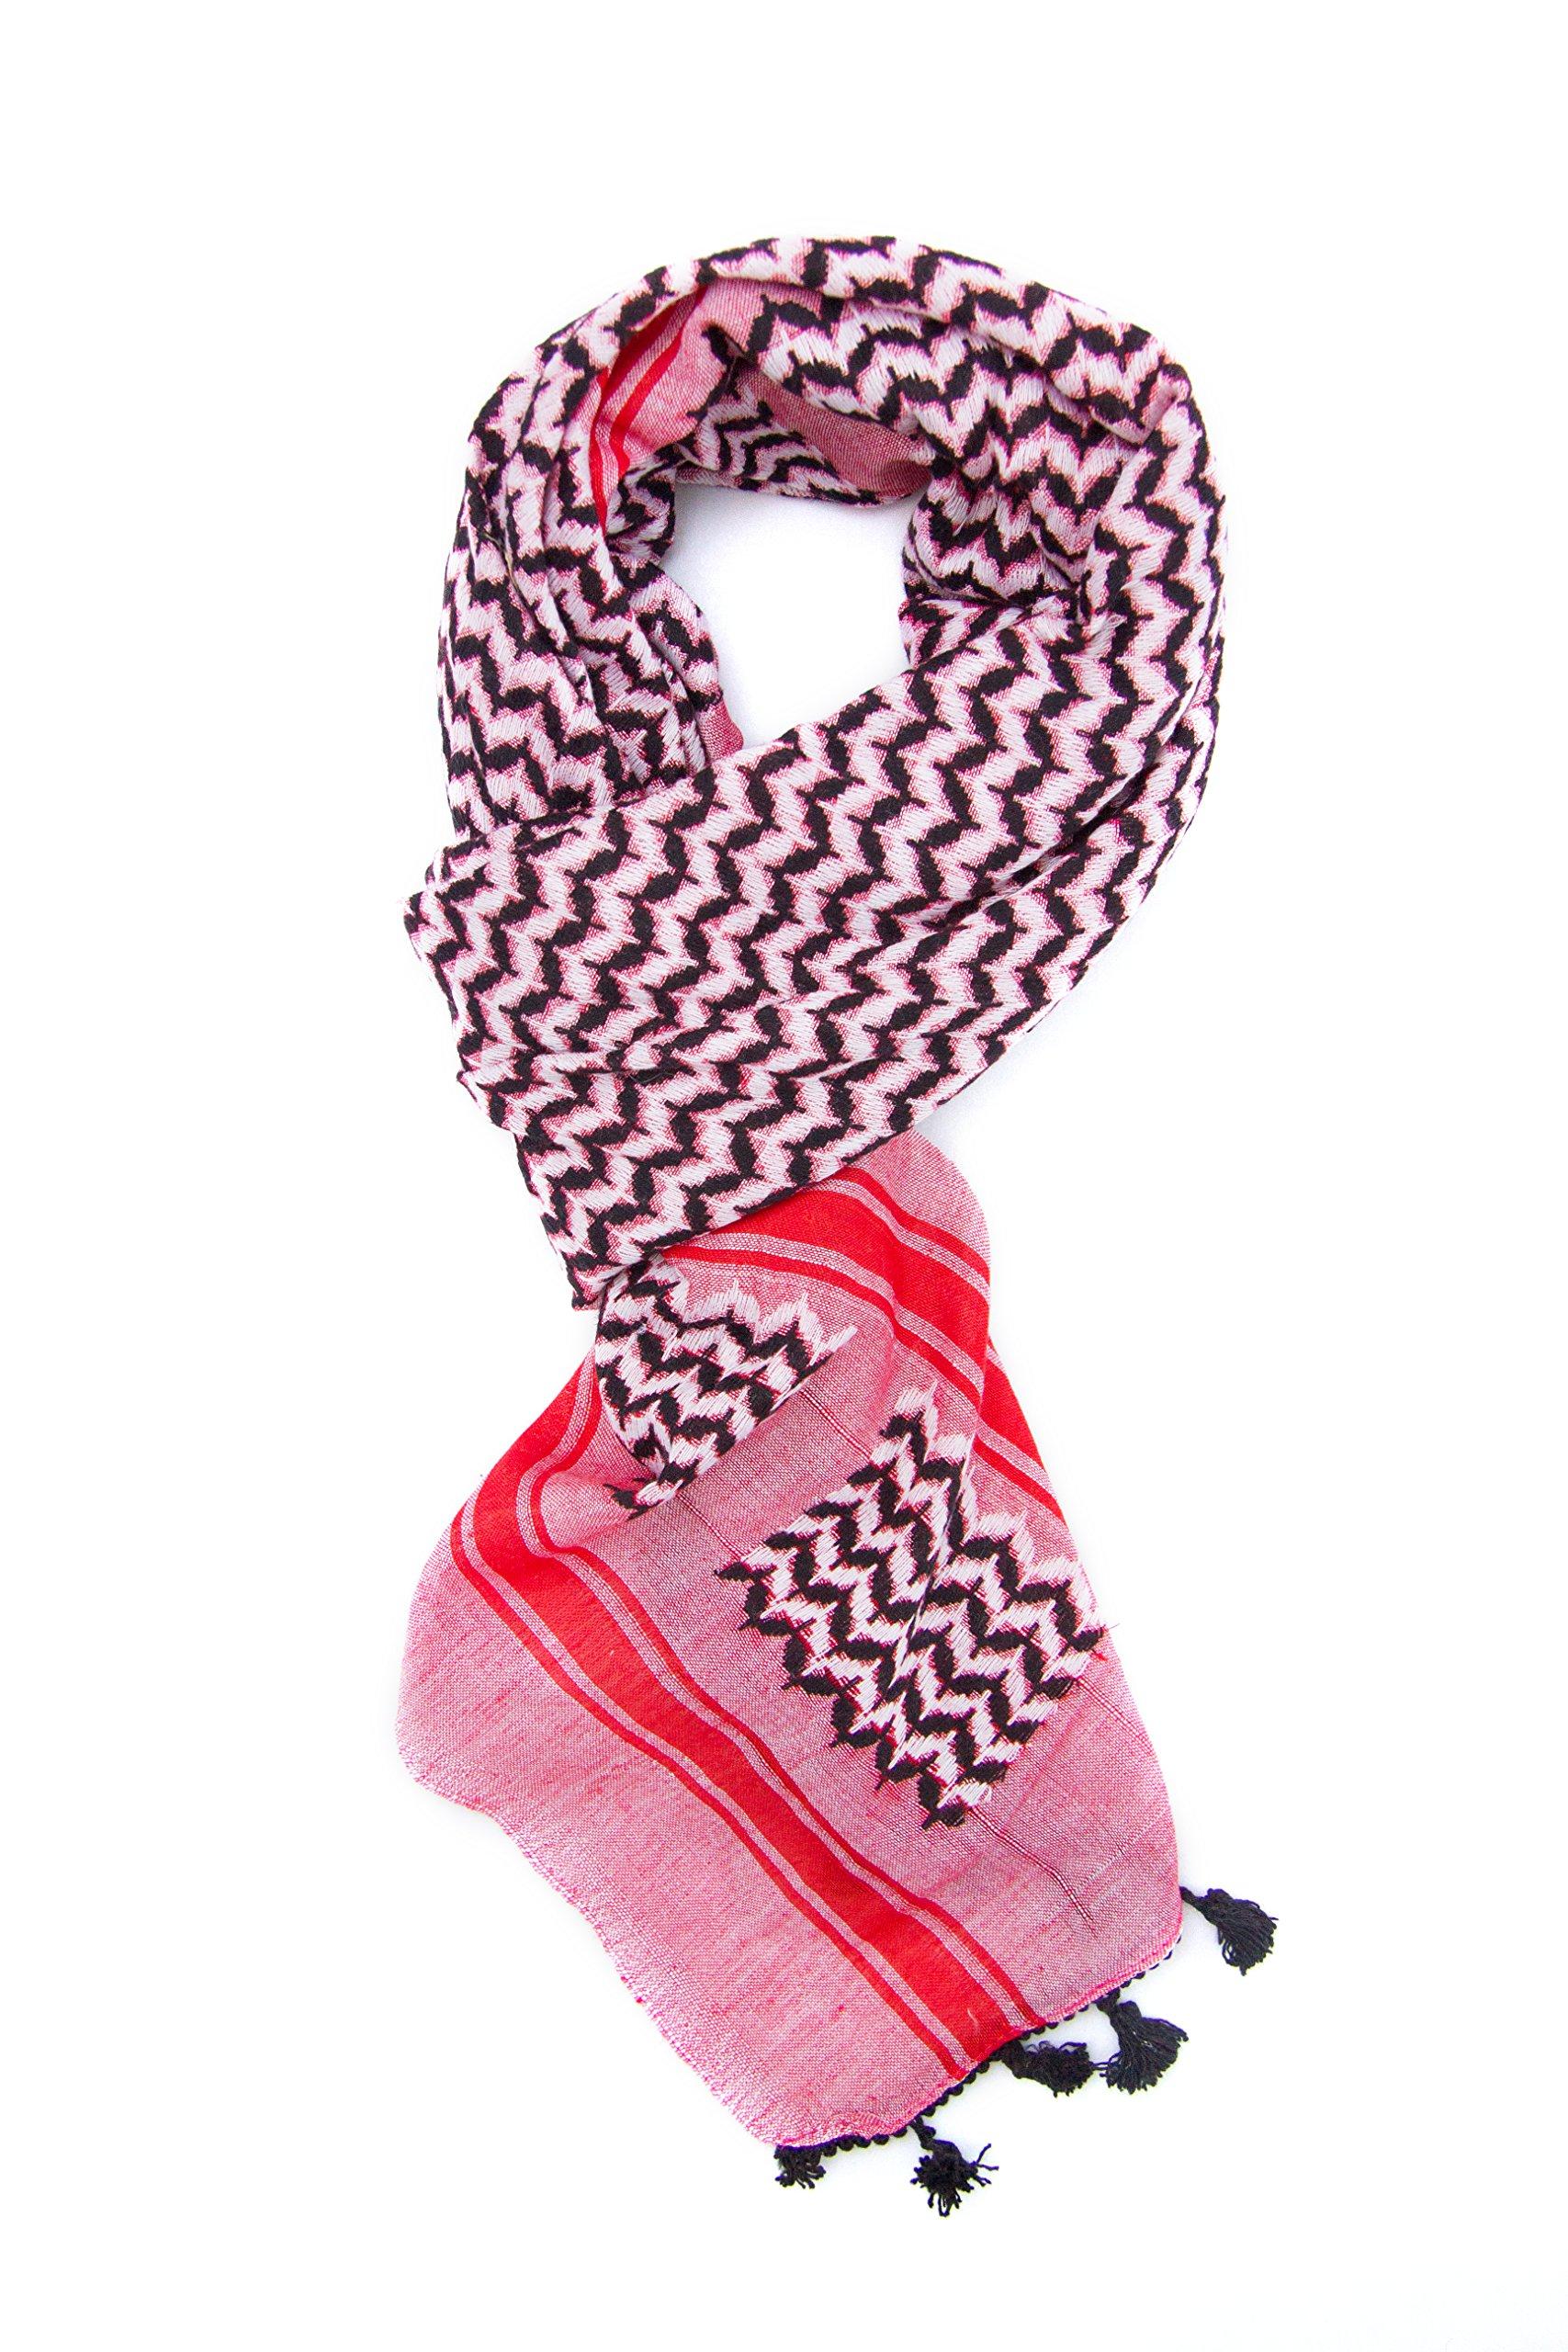 Hirbawi Premium Arabic Scarf 100% Cotton Shemagh Keffiyeh 47''x47'' Arab Scarf (Pink Zahra) Made in Palestine by Hirbawi (Image #5)